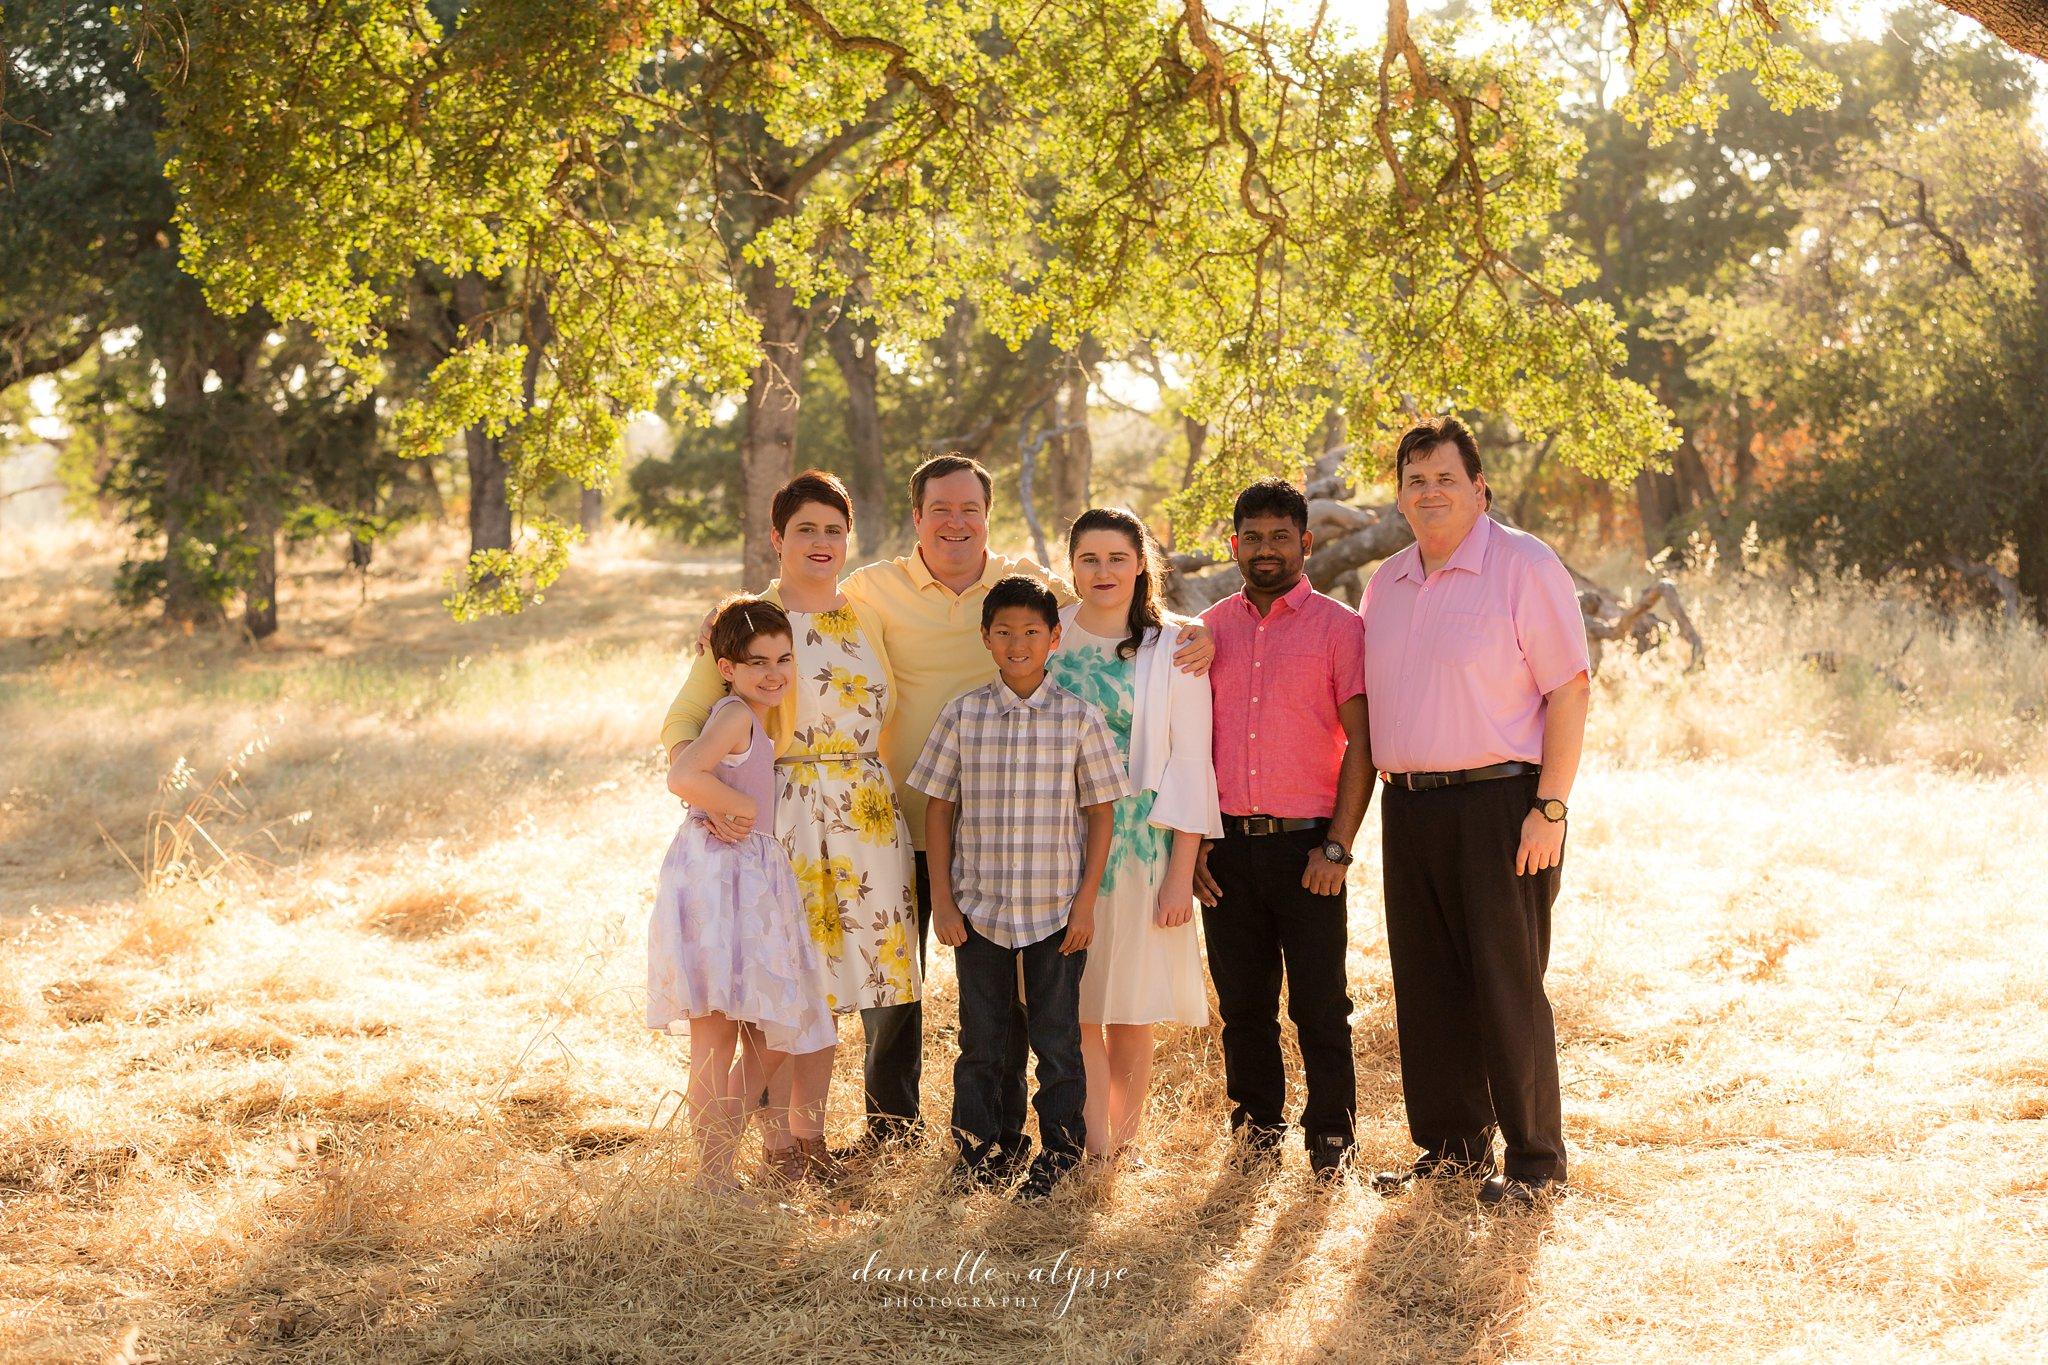 180627_family_portrait_megan_folsom_california_danielle_alysse_photography_1_WEB.jpg